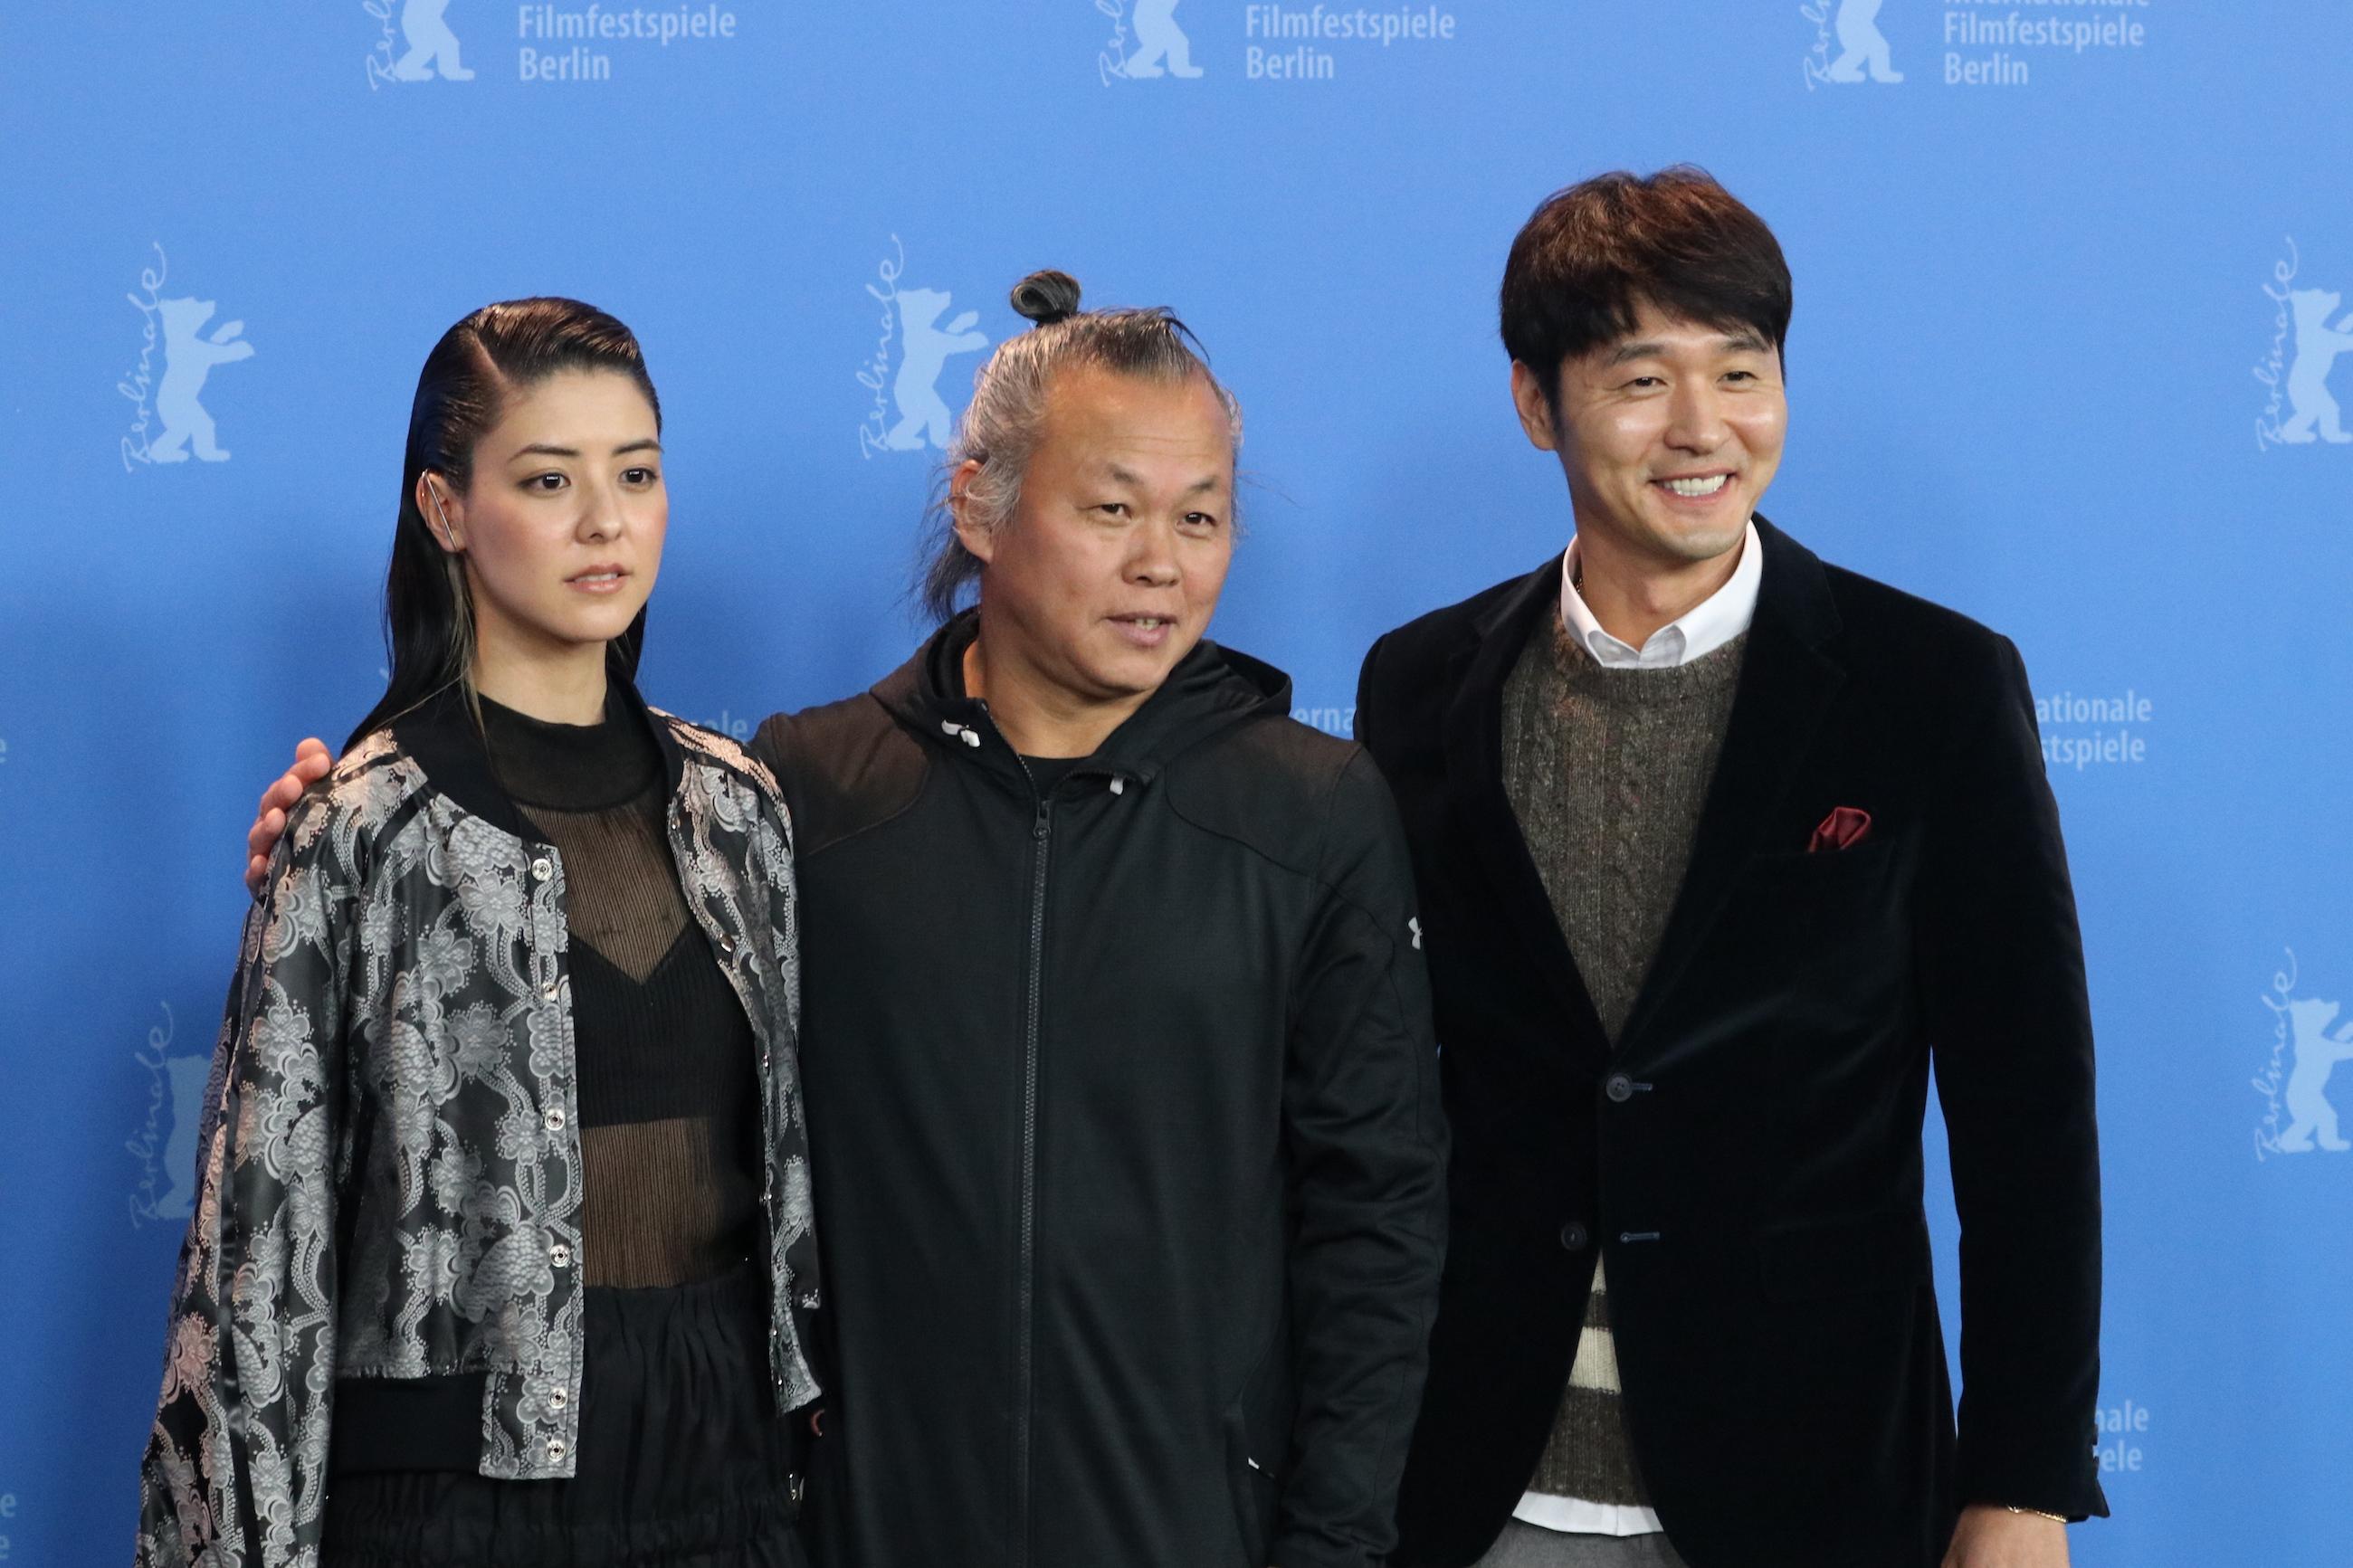 Berlino 2018: Kim Ki-duk e il cast al photocall di Human, Space, Time and Human